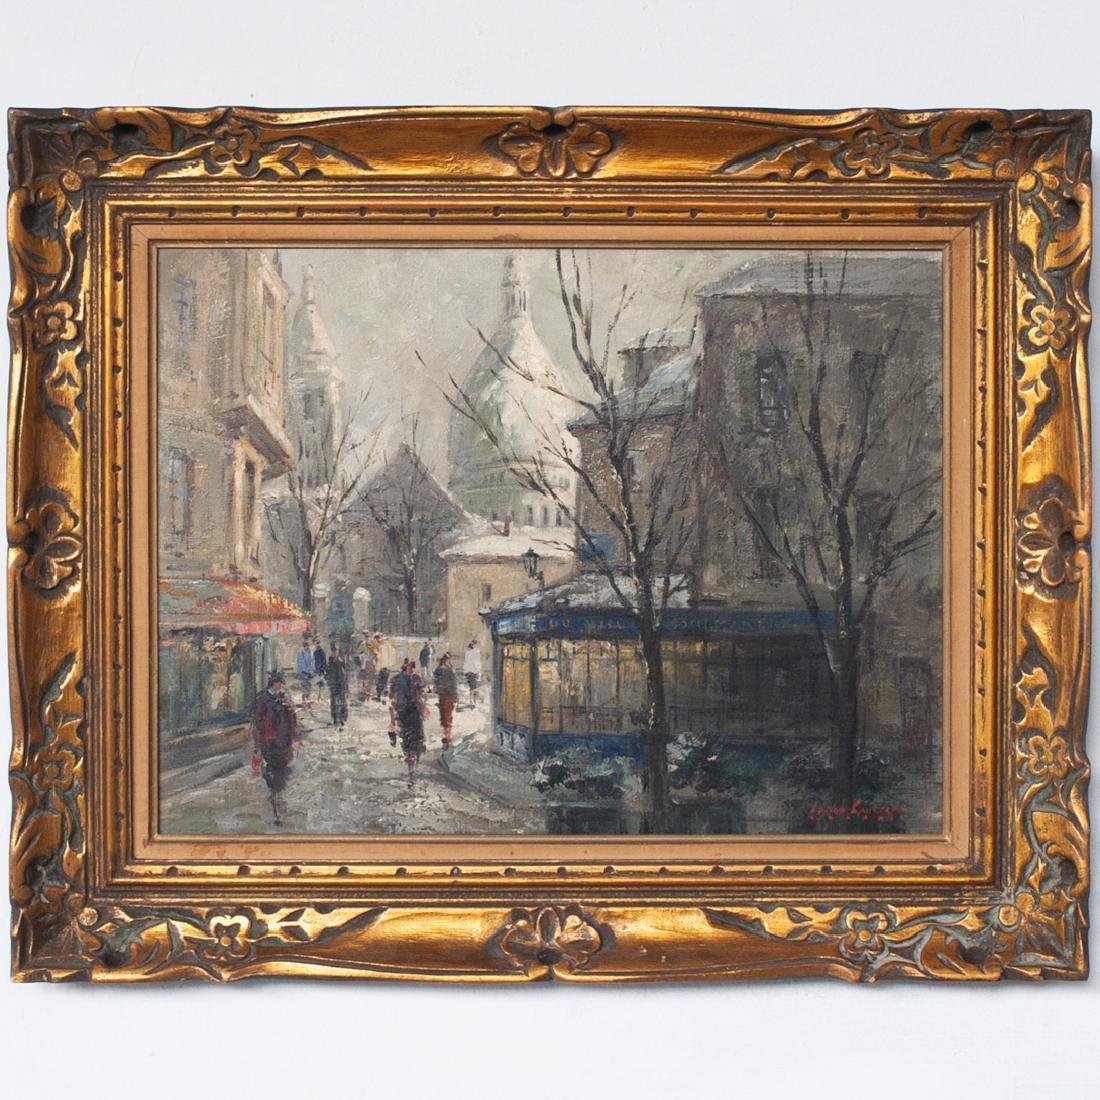 Jean-Dominique Van Caulaert (French. 1897-1979) Oil on